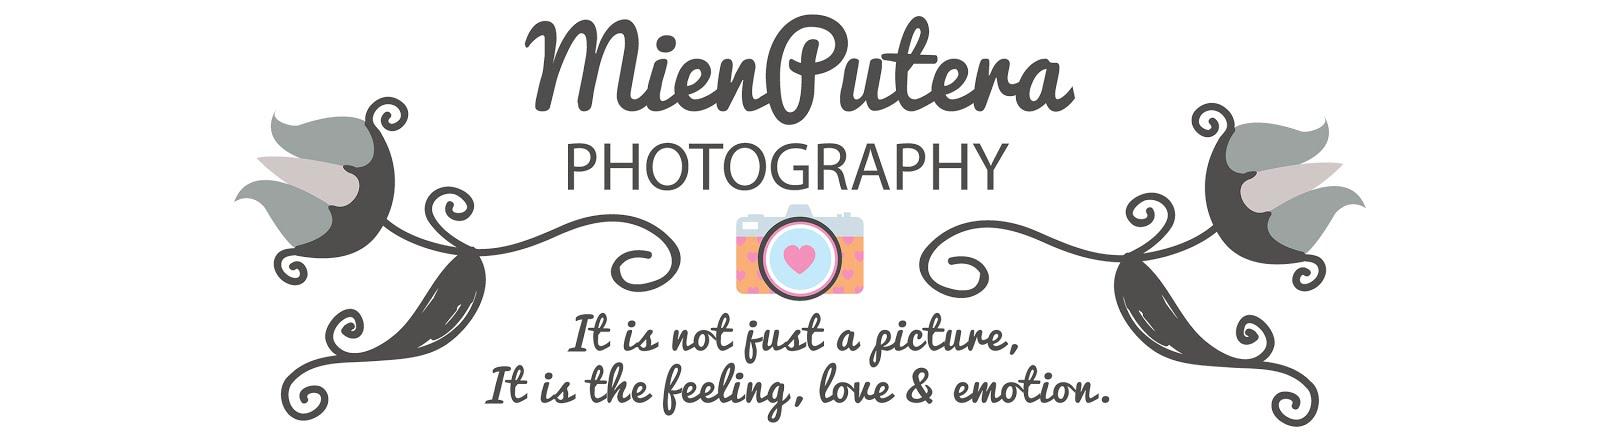 MIENPUTERA PHOTOGRAPHY